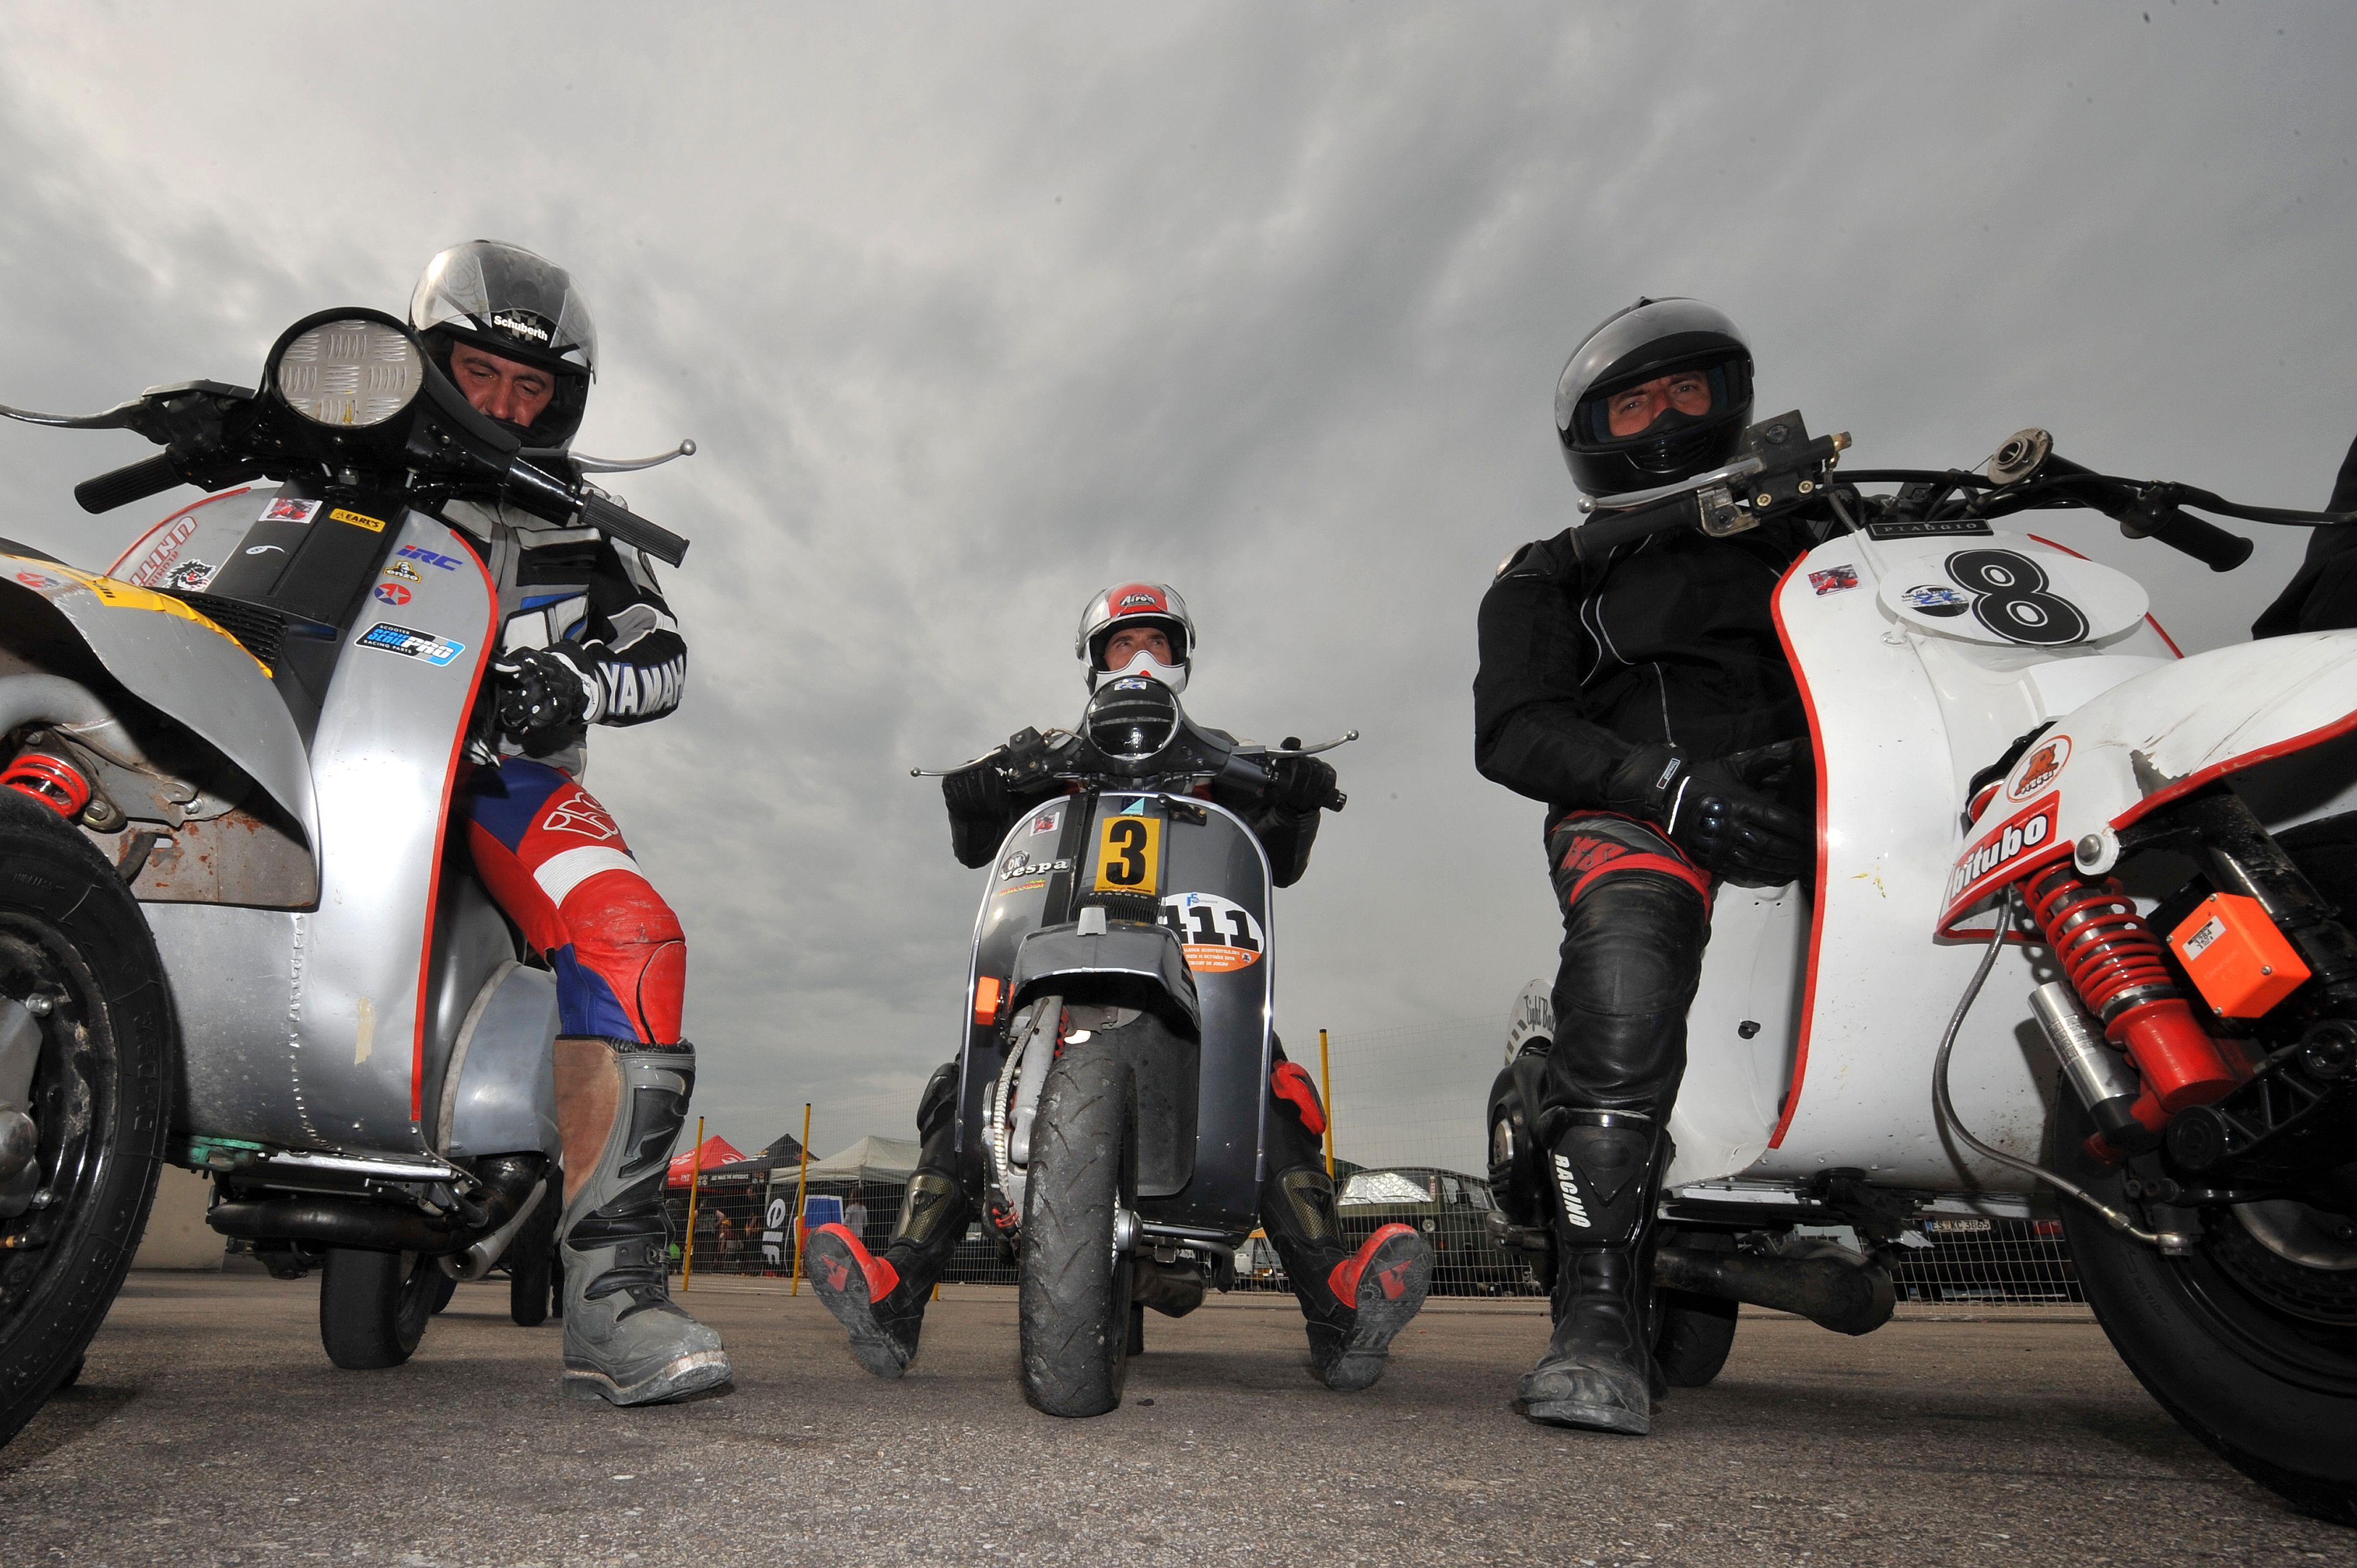 On the startin grid ! Sprint Mirecourt 2009, France, photo Michel Lemarié DR